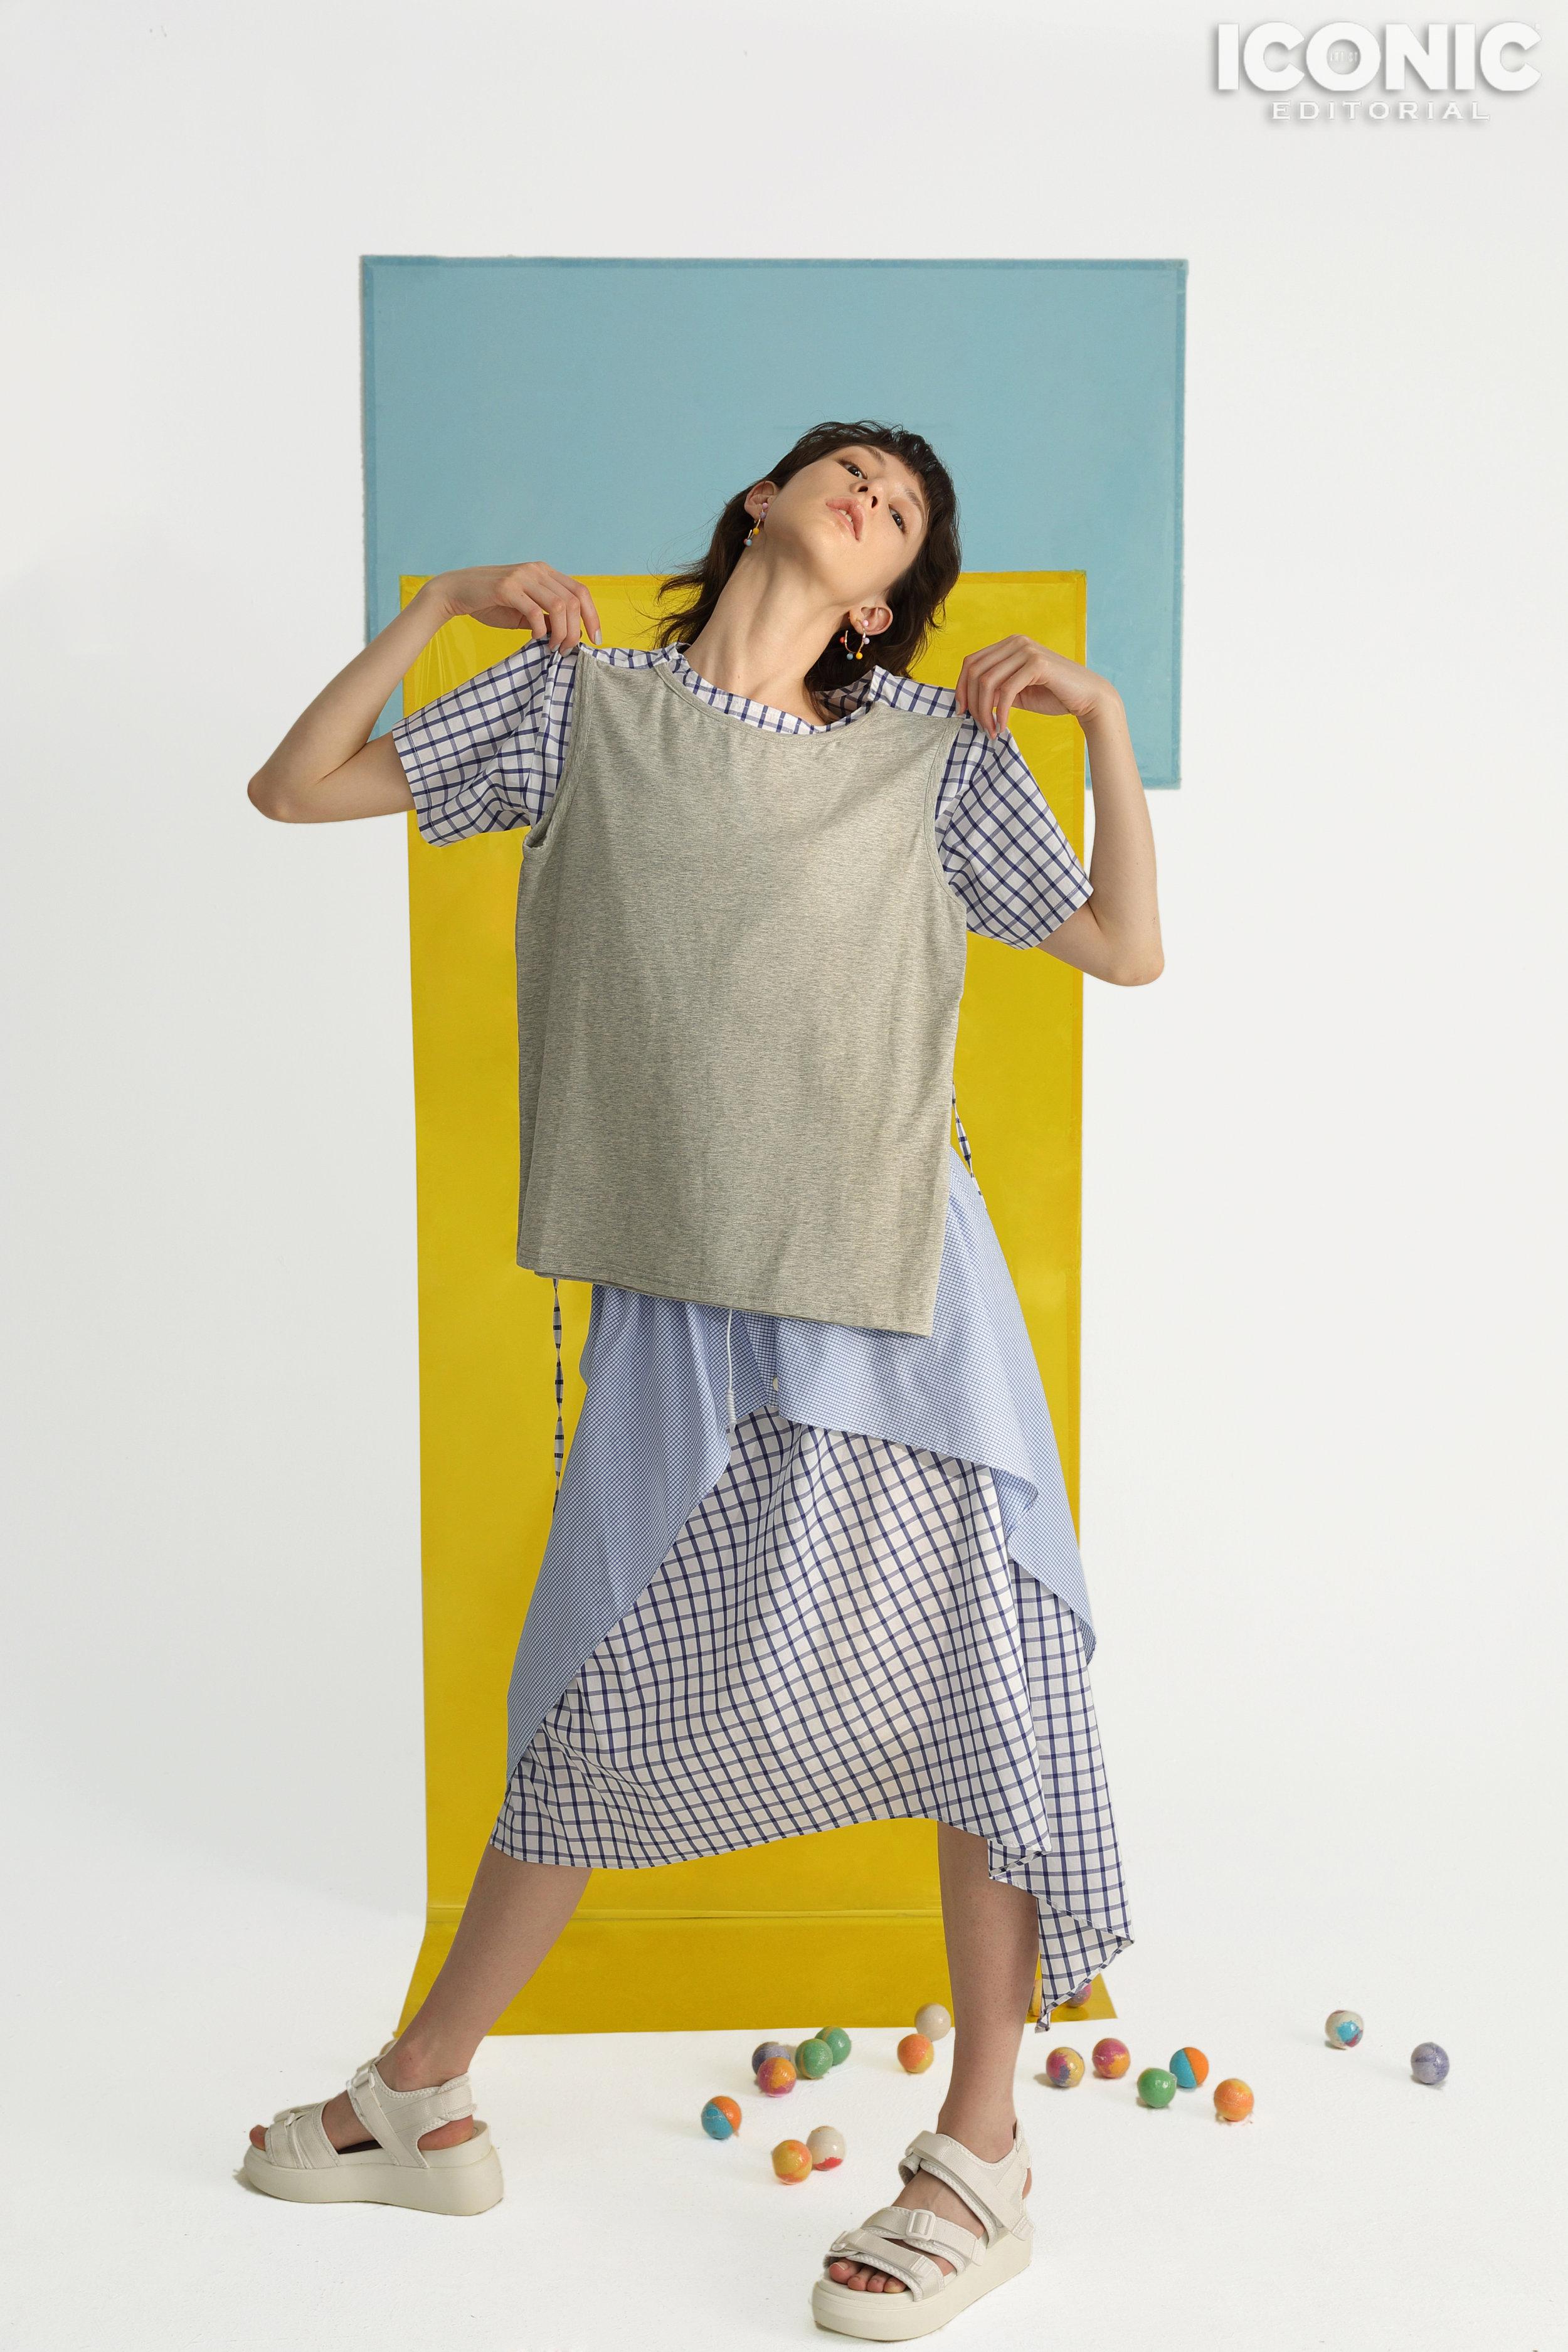 8/8  T-shirt, Blouse & Skirt /  @cj_yao   © Leesin